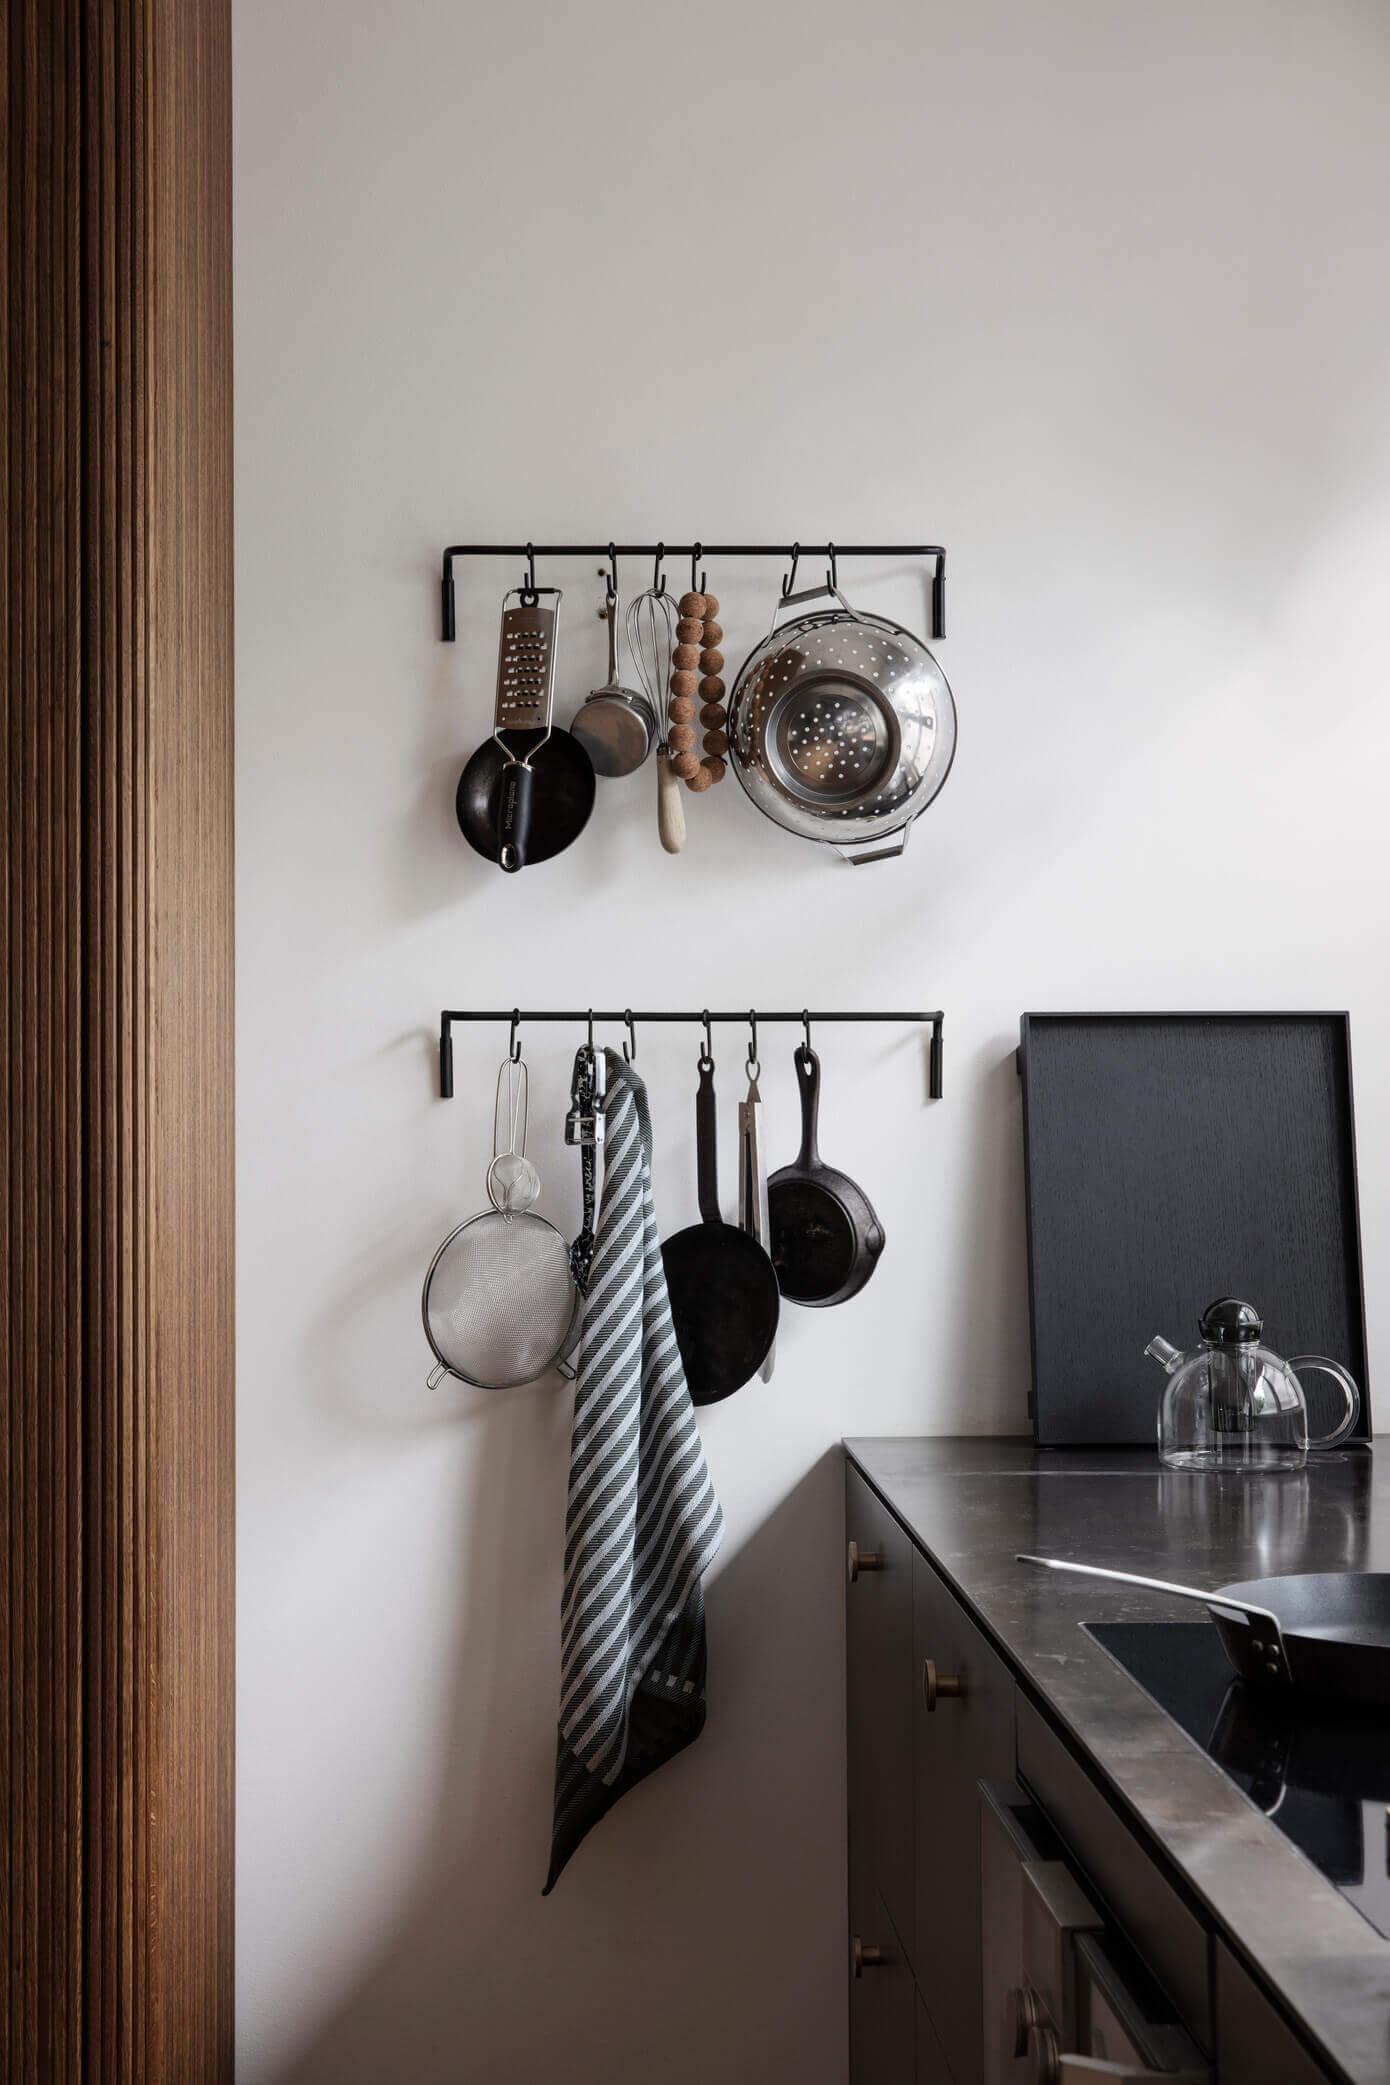 Accessoire cuisine design